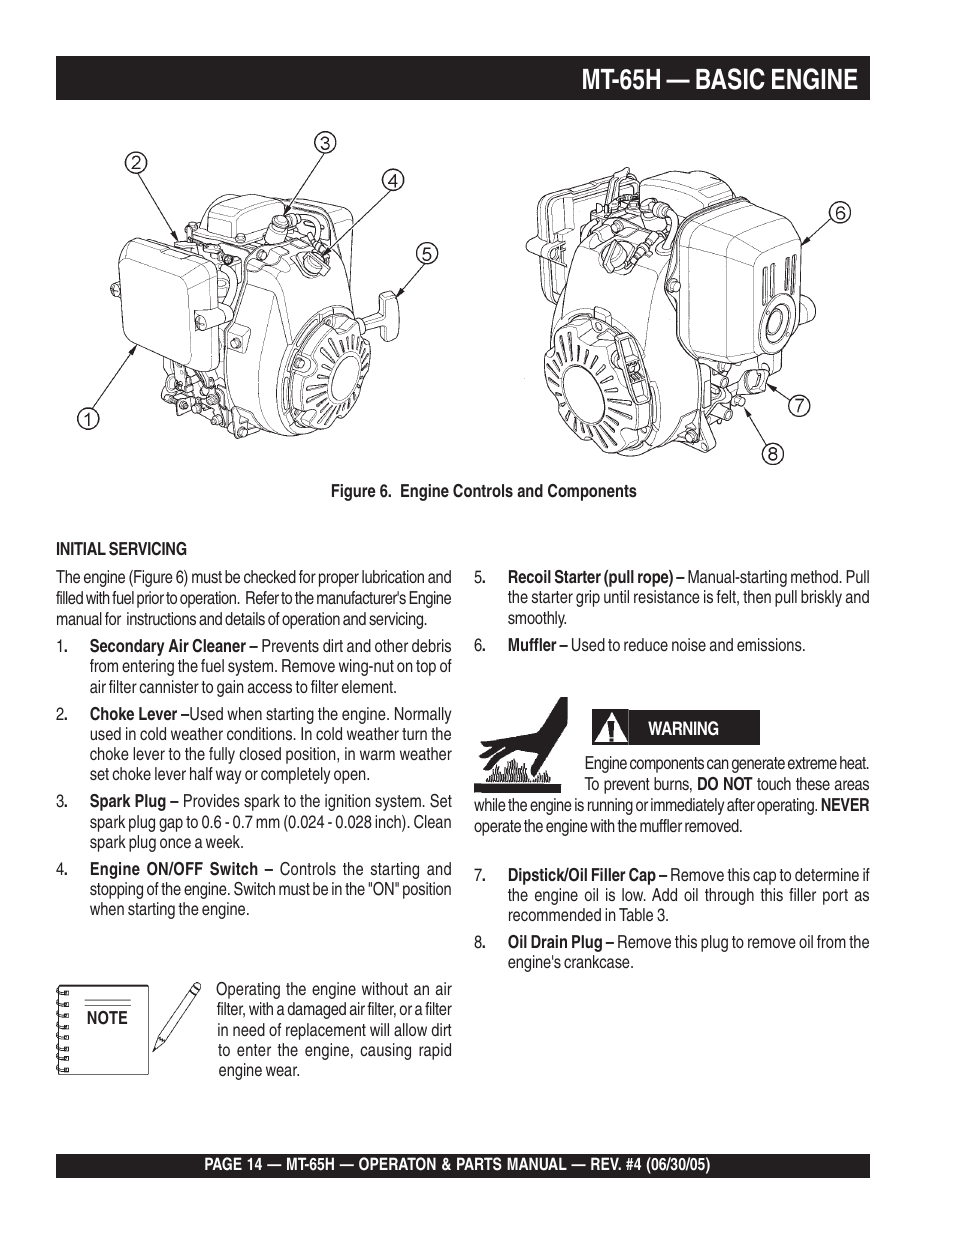 mt 65h basic engine multiquip mt65h user manual page 14 64